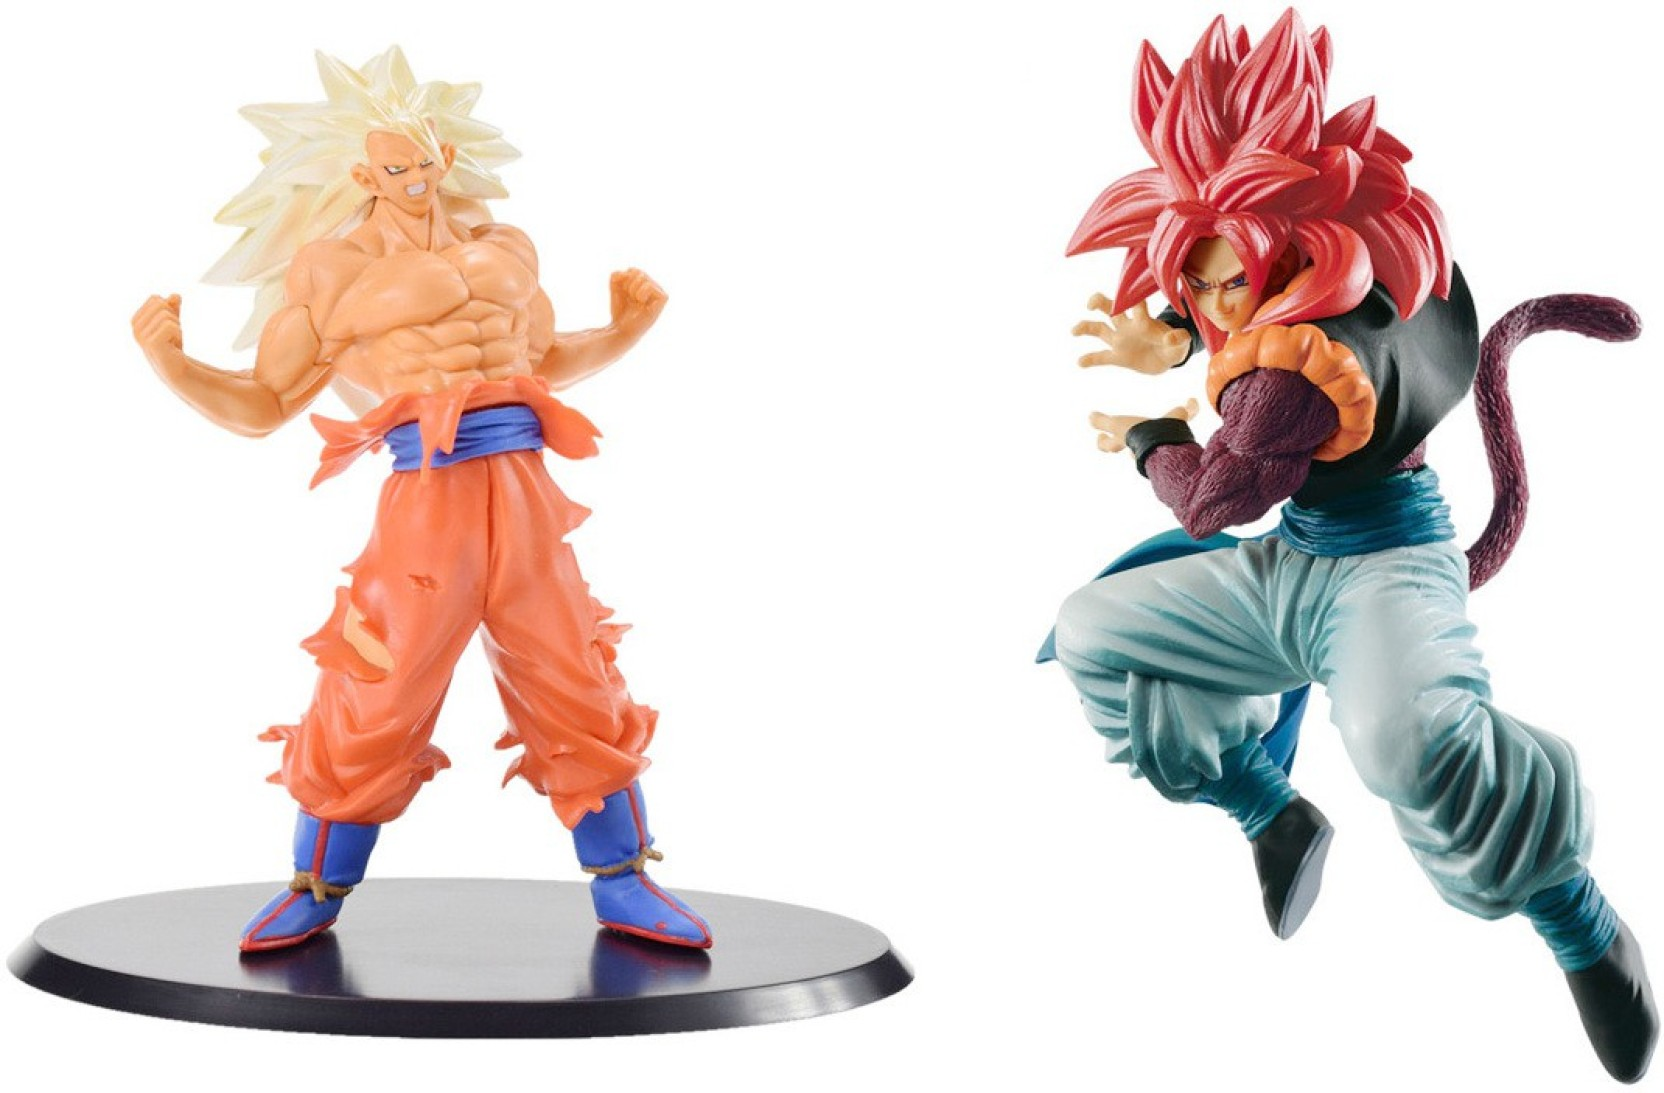 Imodish Dragon Ball Z Dbz Set Of 2 Pcs Goku Ultra Instinct